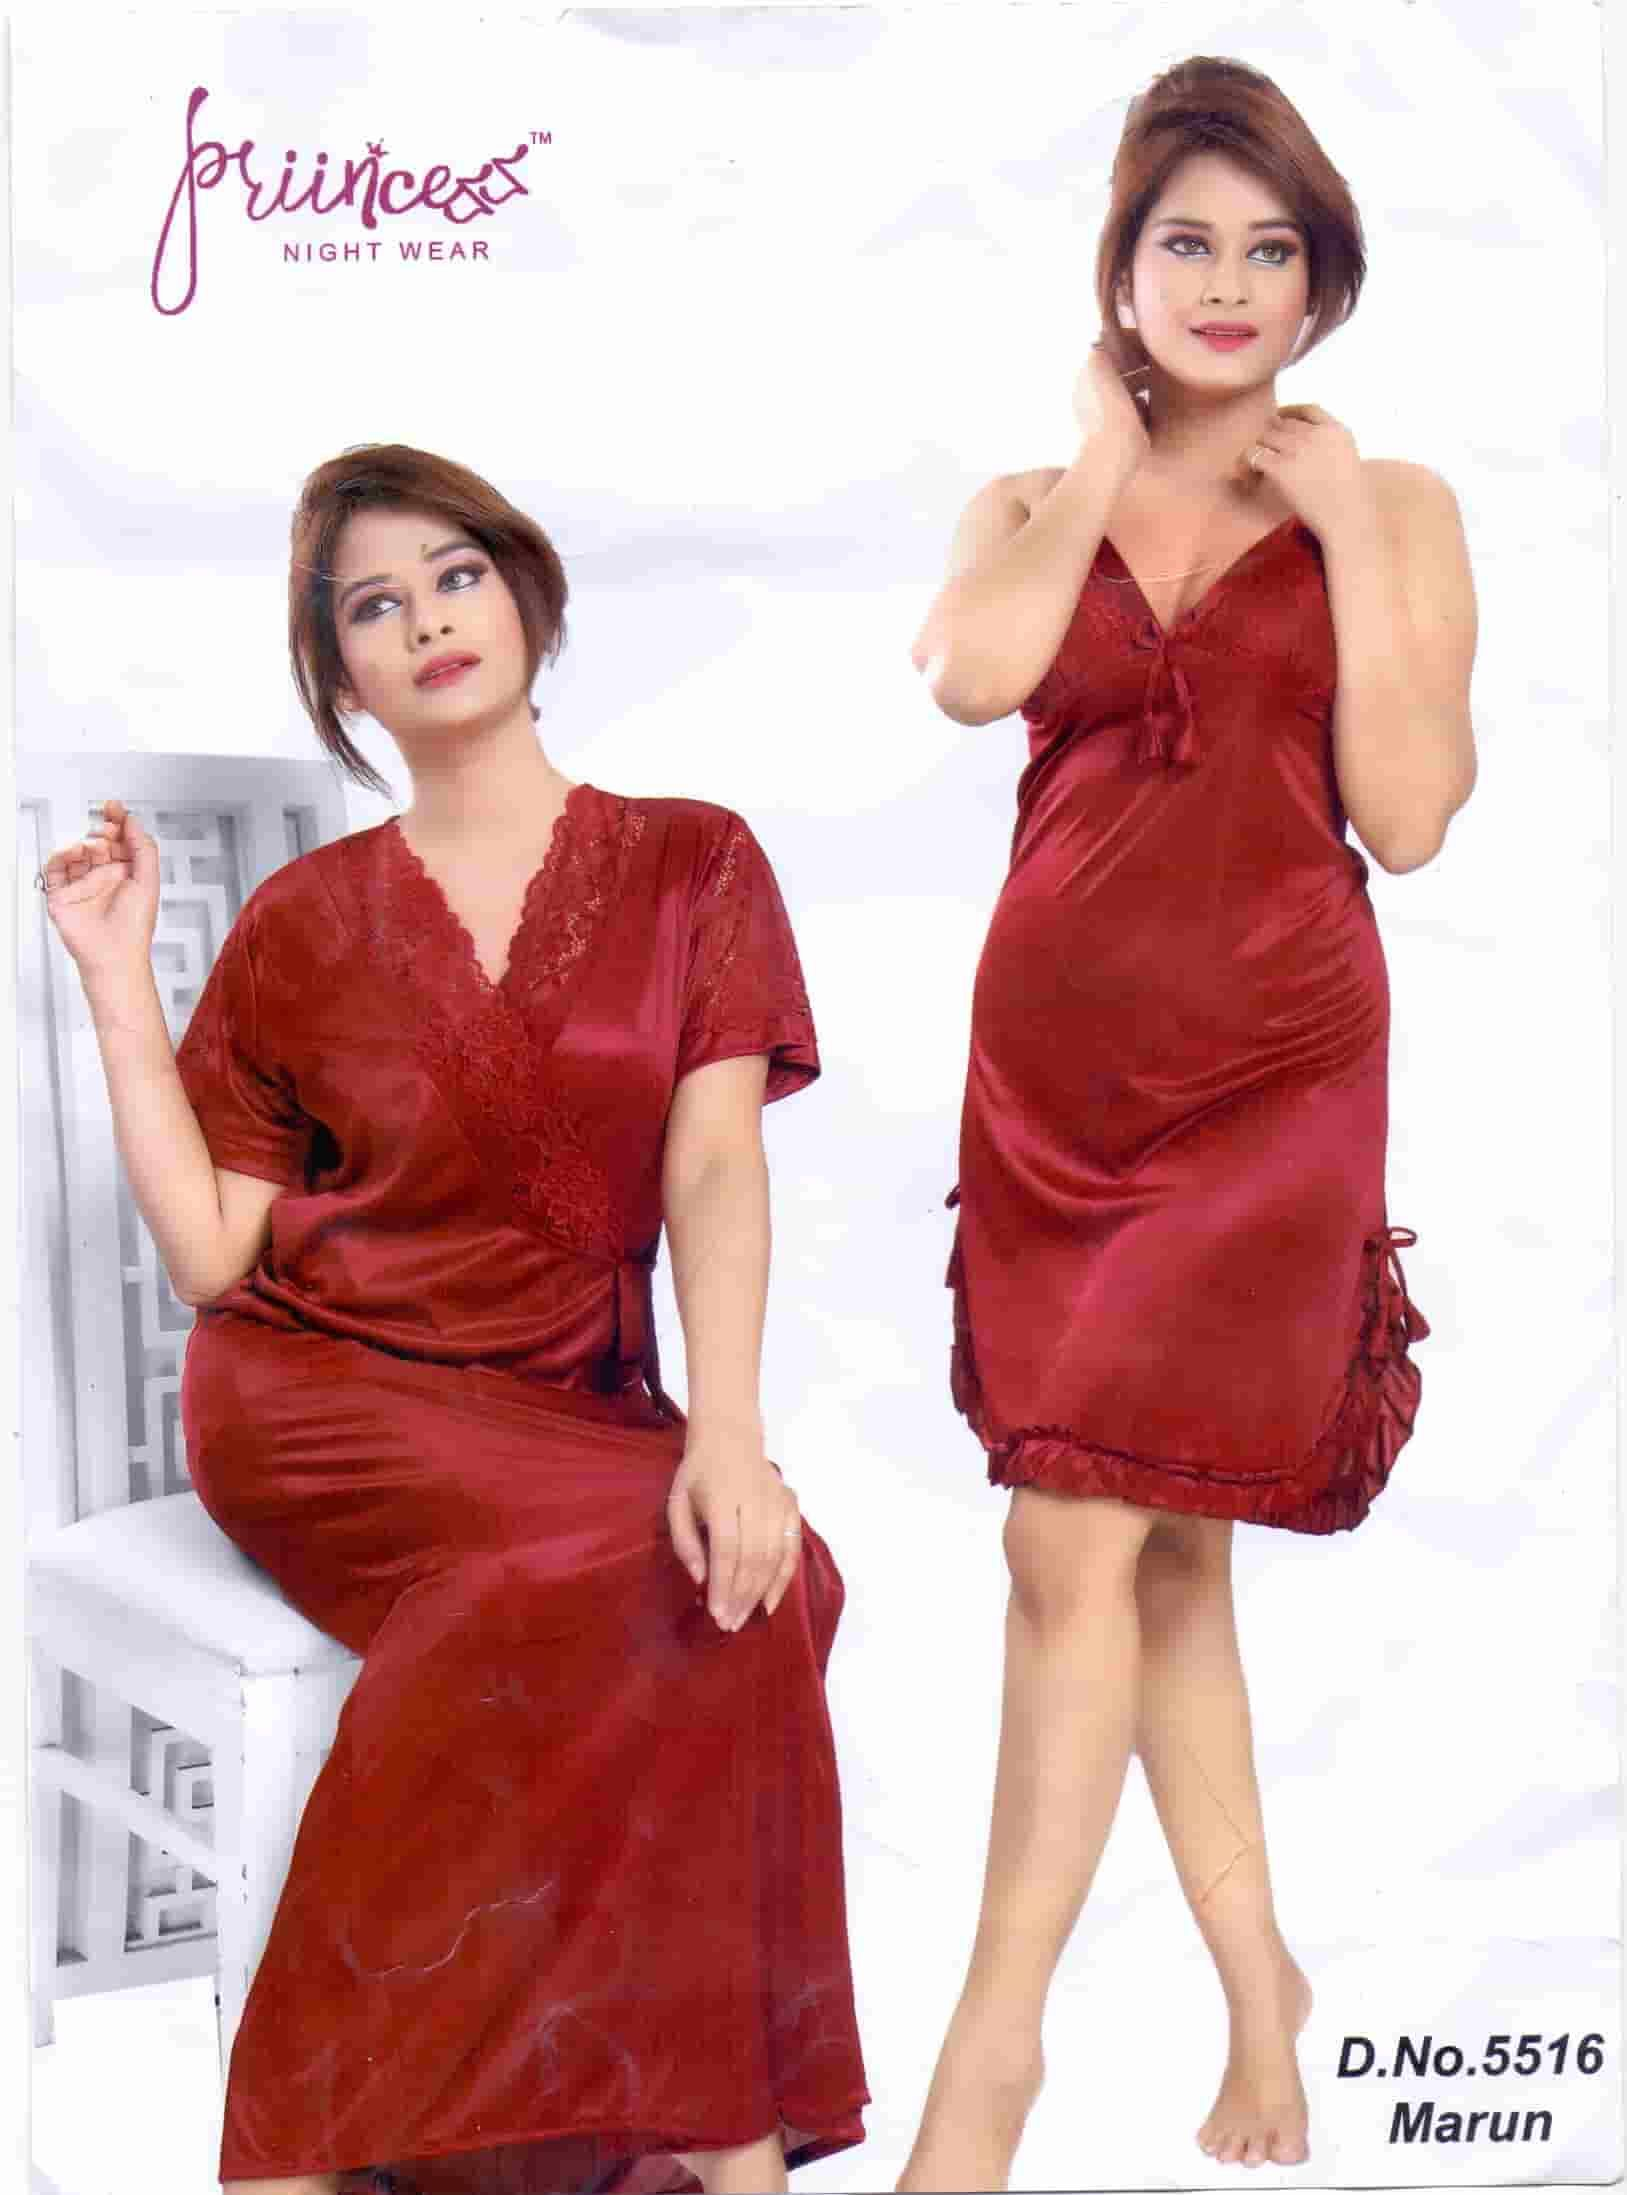 80ec12460c6 Nightdress - Bra - Lingerie - Online shopping BD - Sohojshop